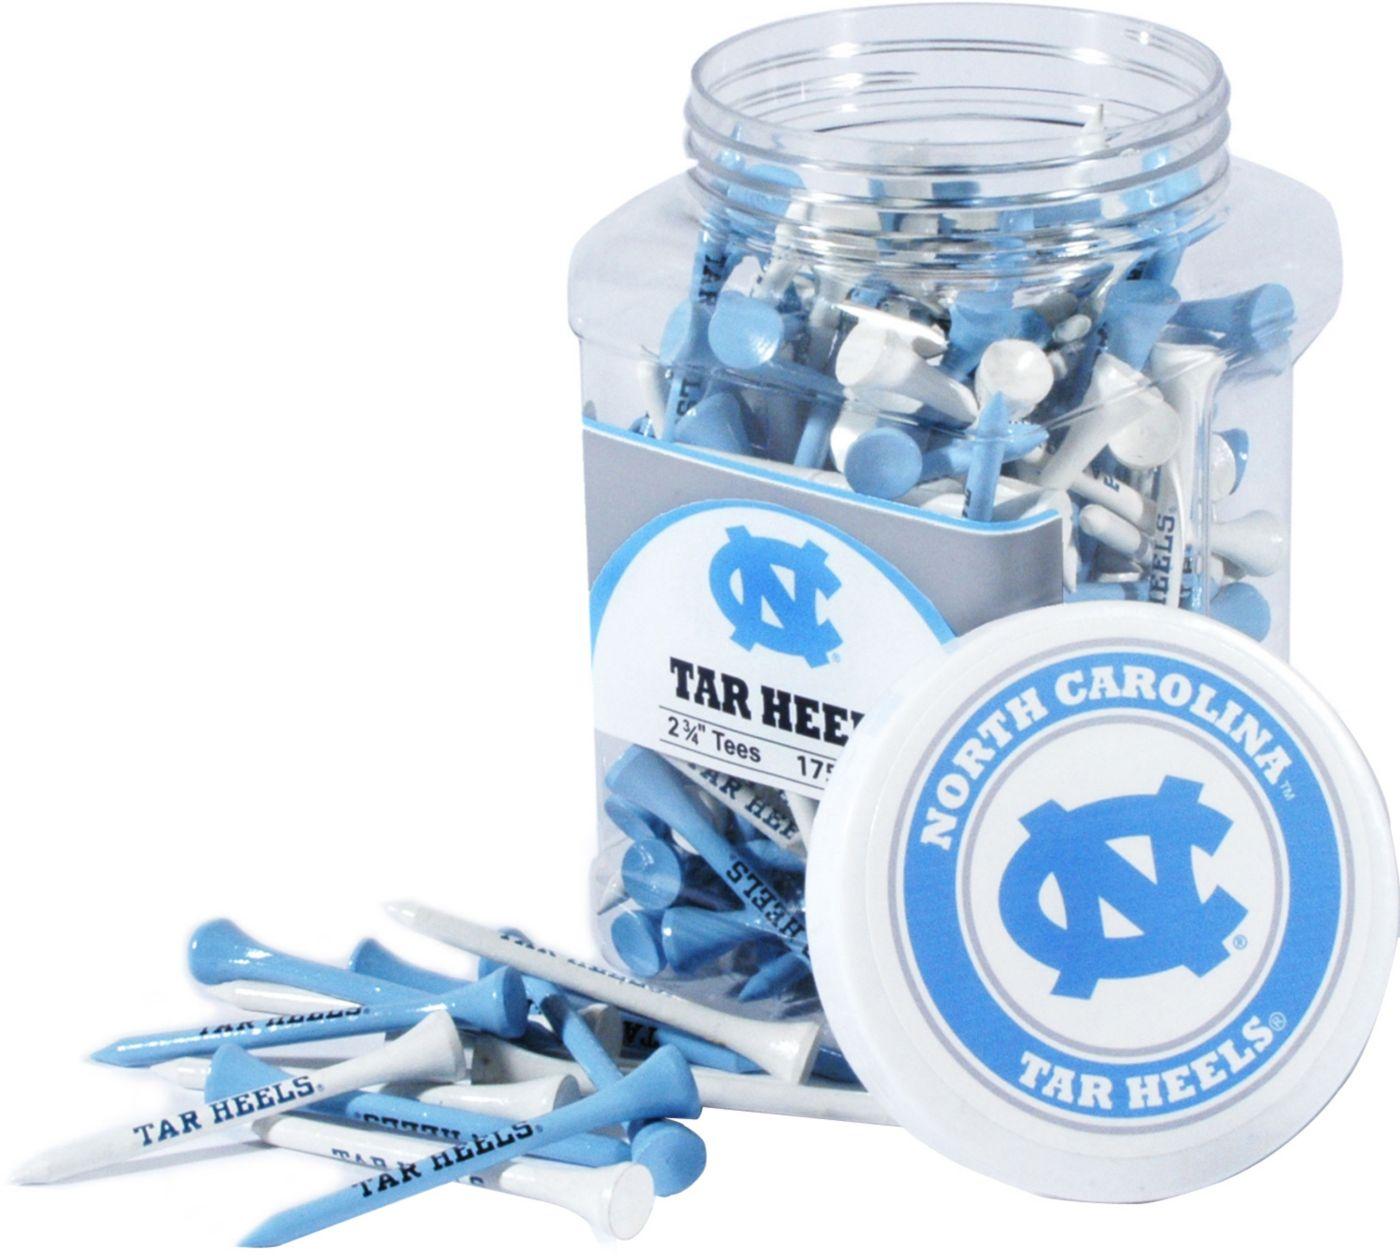 Team Golf UNC Tar Heels Tee Jar - 175 Pack